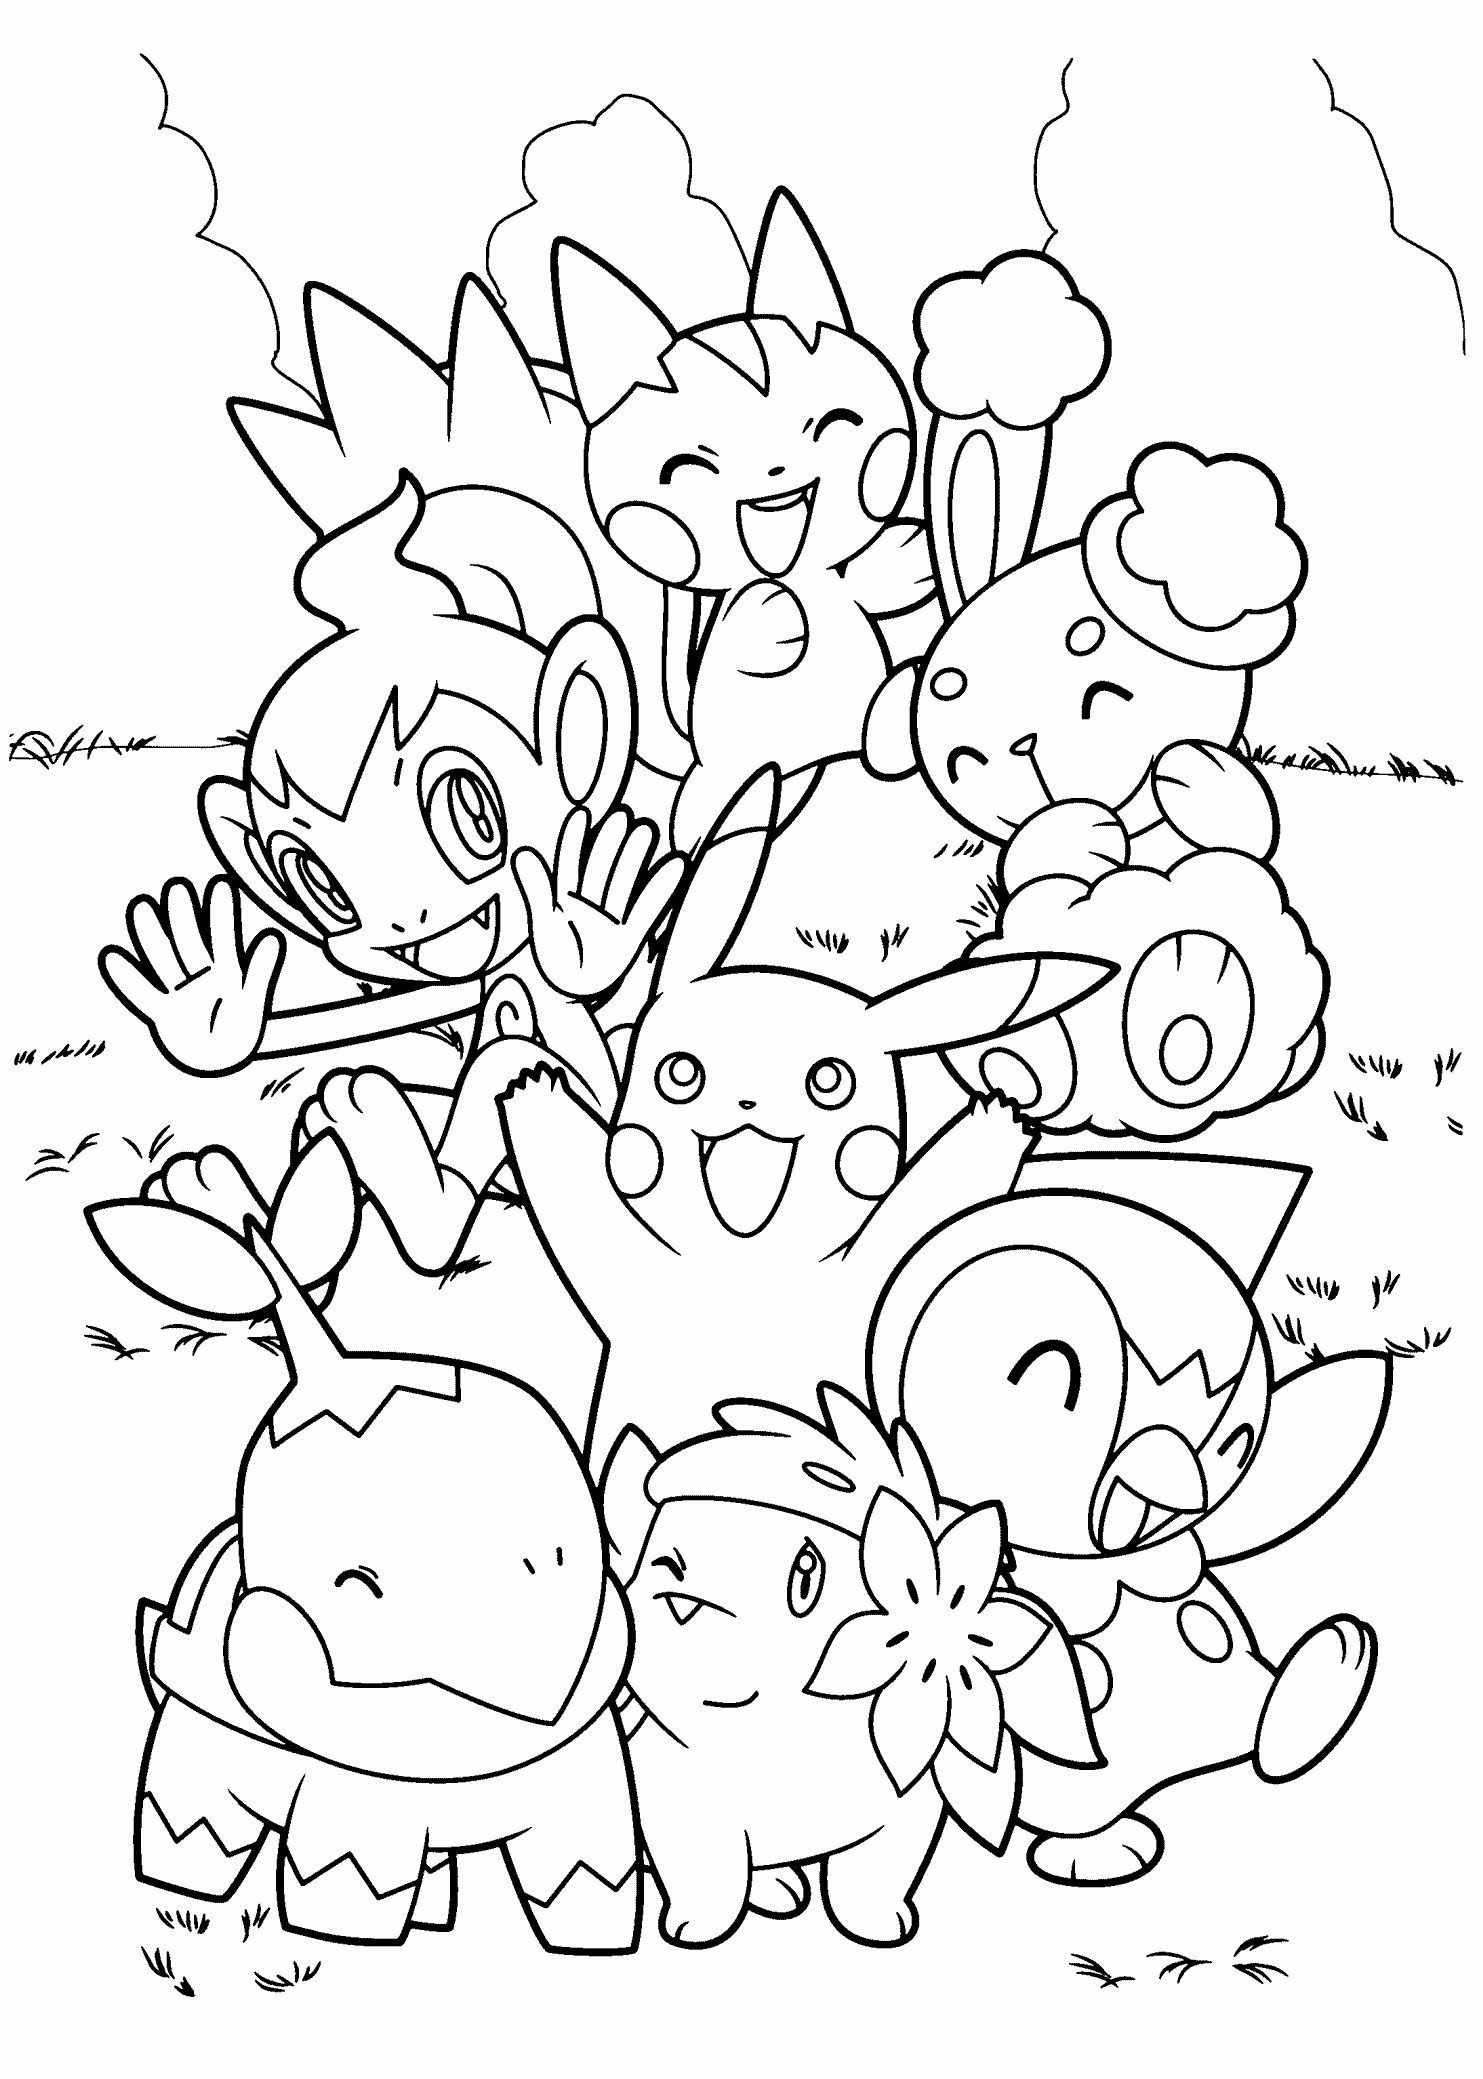 Pokemon Coloring Pages Google Search Pokemon Coloring Pages Pokemon Coloring Pikachu Coloring Page